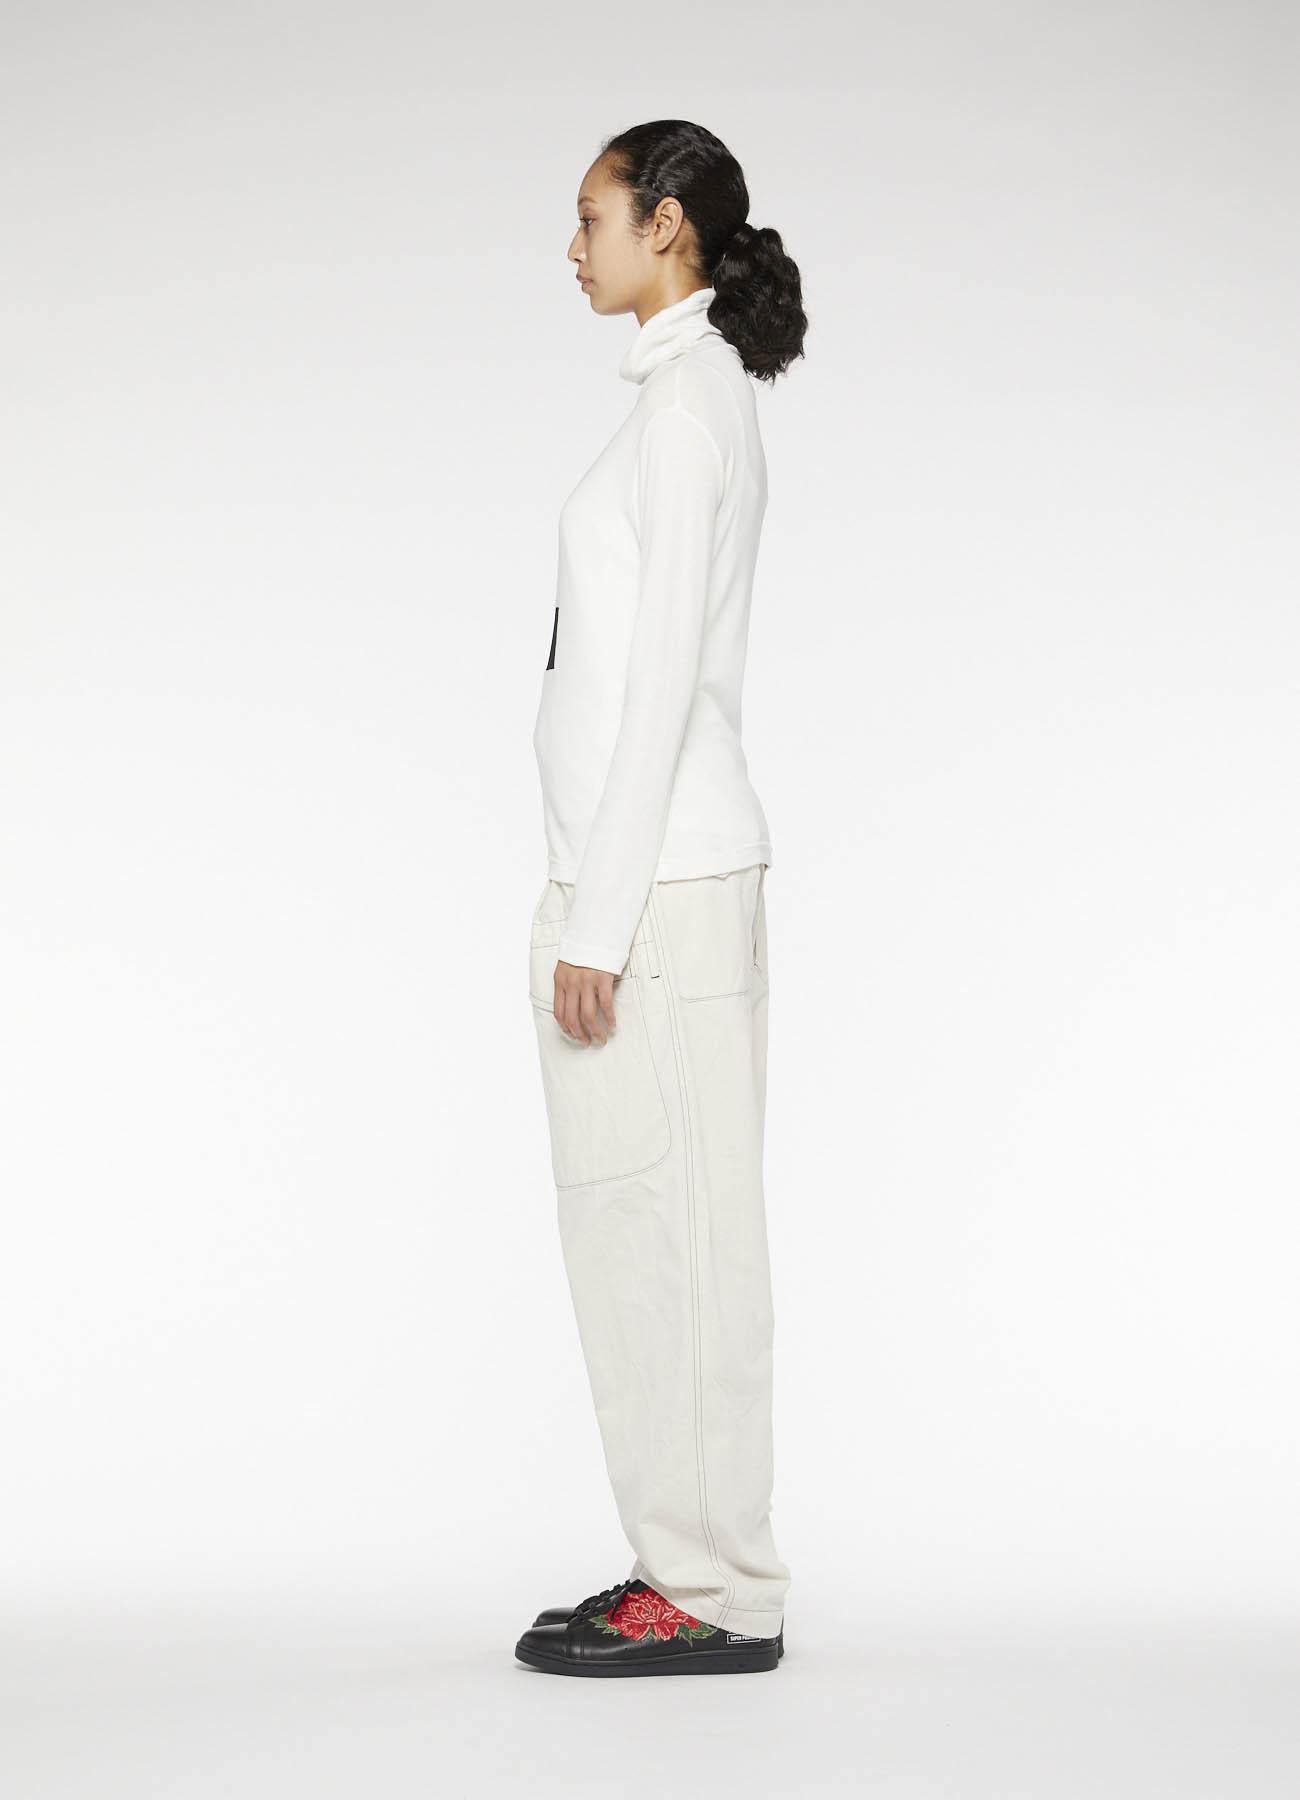 MILANORIB x PATCHWORK HIGHT-NECKED COLLAR T-SHIRT